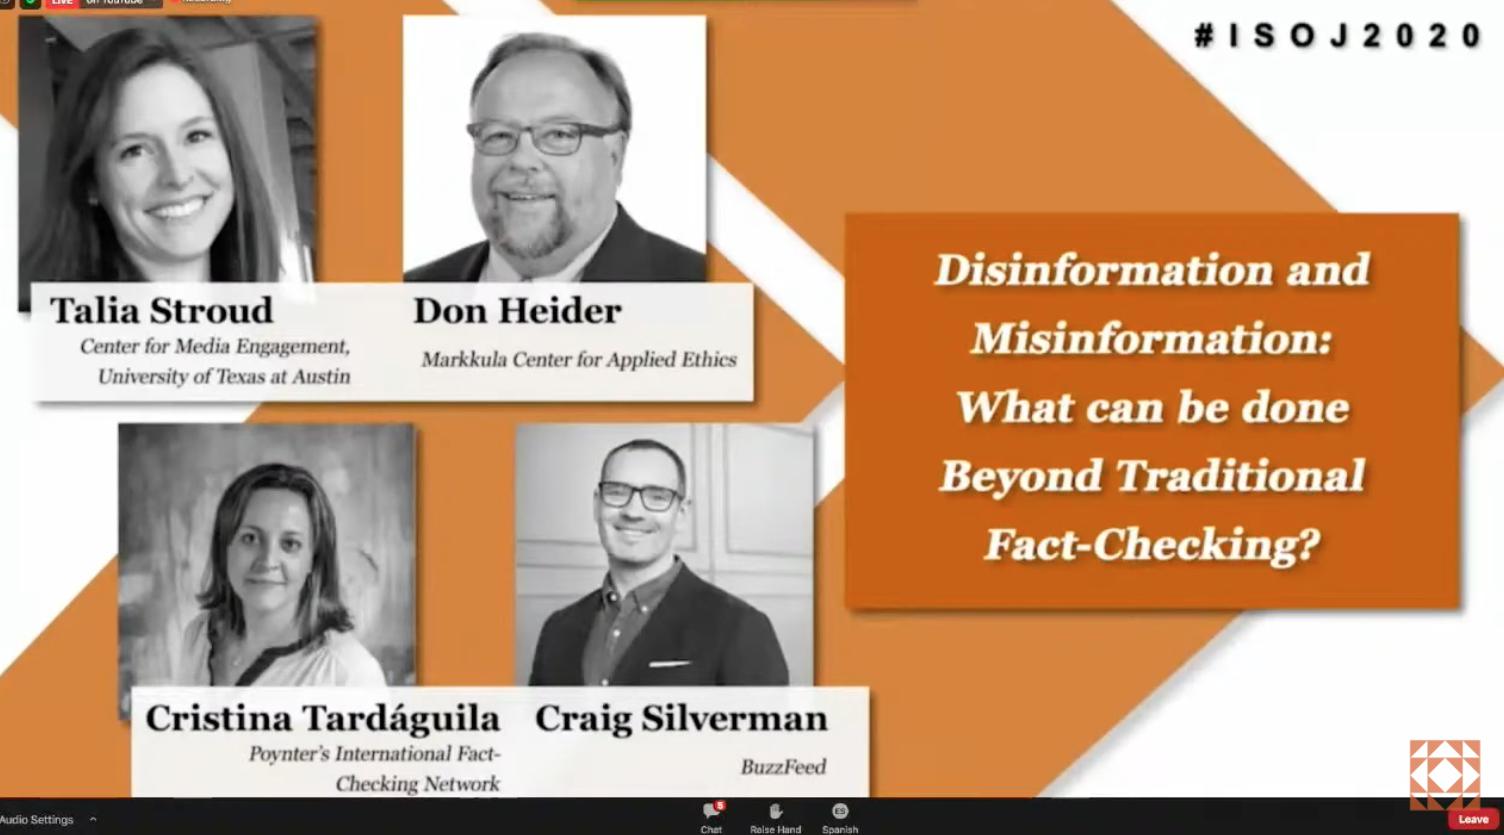 Misinformation and disinformation beyond fact-checking panel ISOJ2020